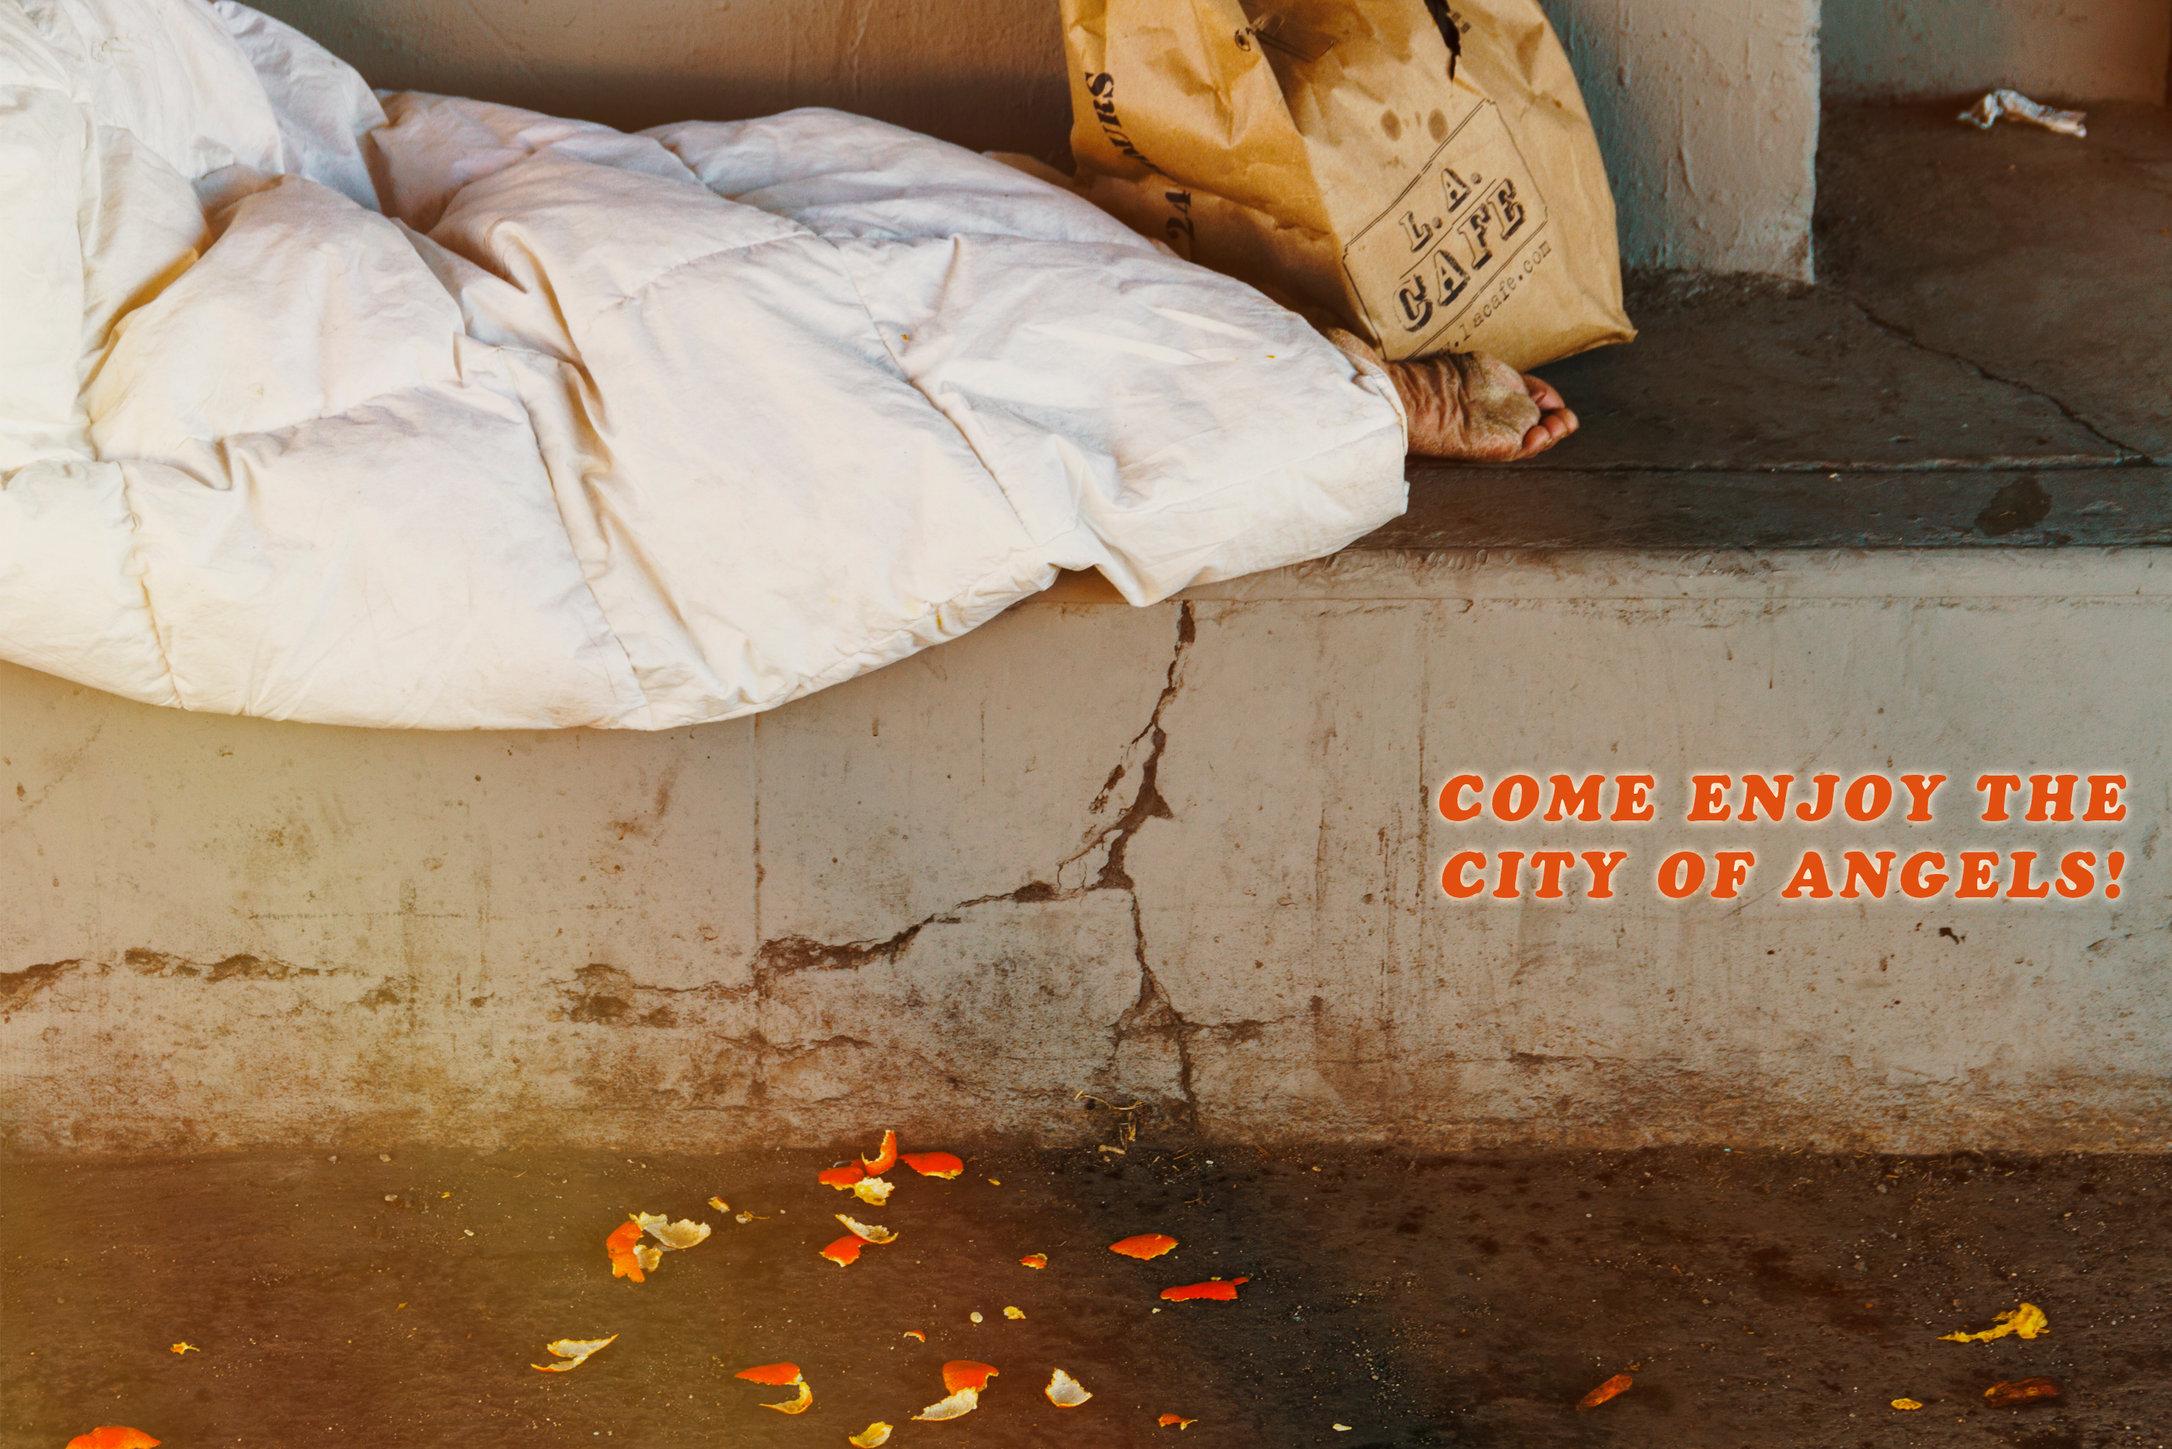 CITY-OF-ANGELS.jpg